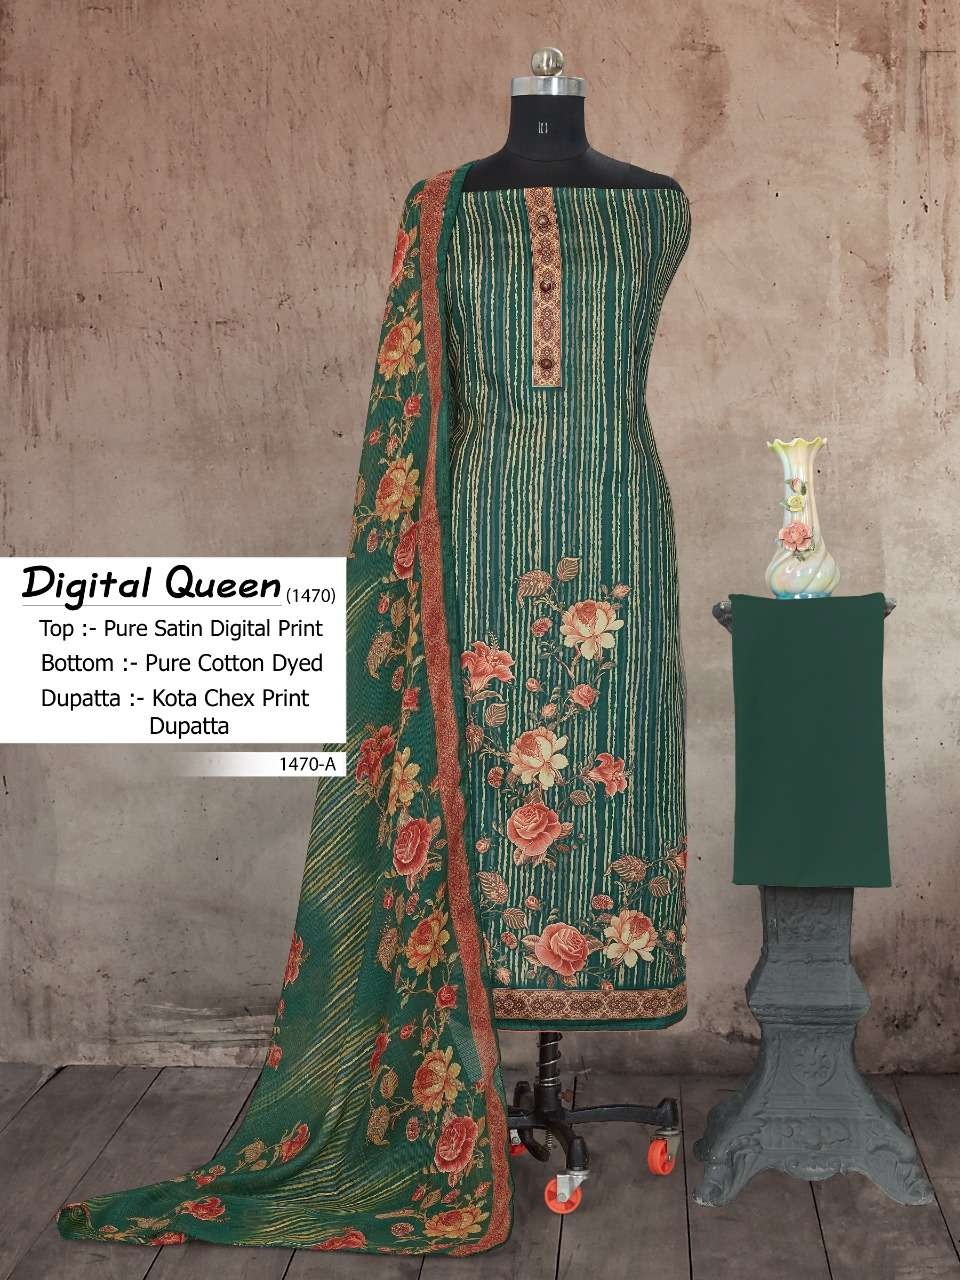 Bipson Fashion Digital Queen 1470 Cotton Satin Digital Print Dress Material Collection